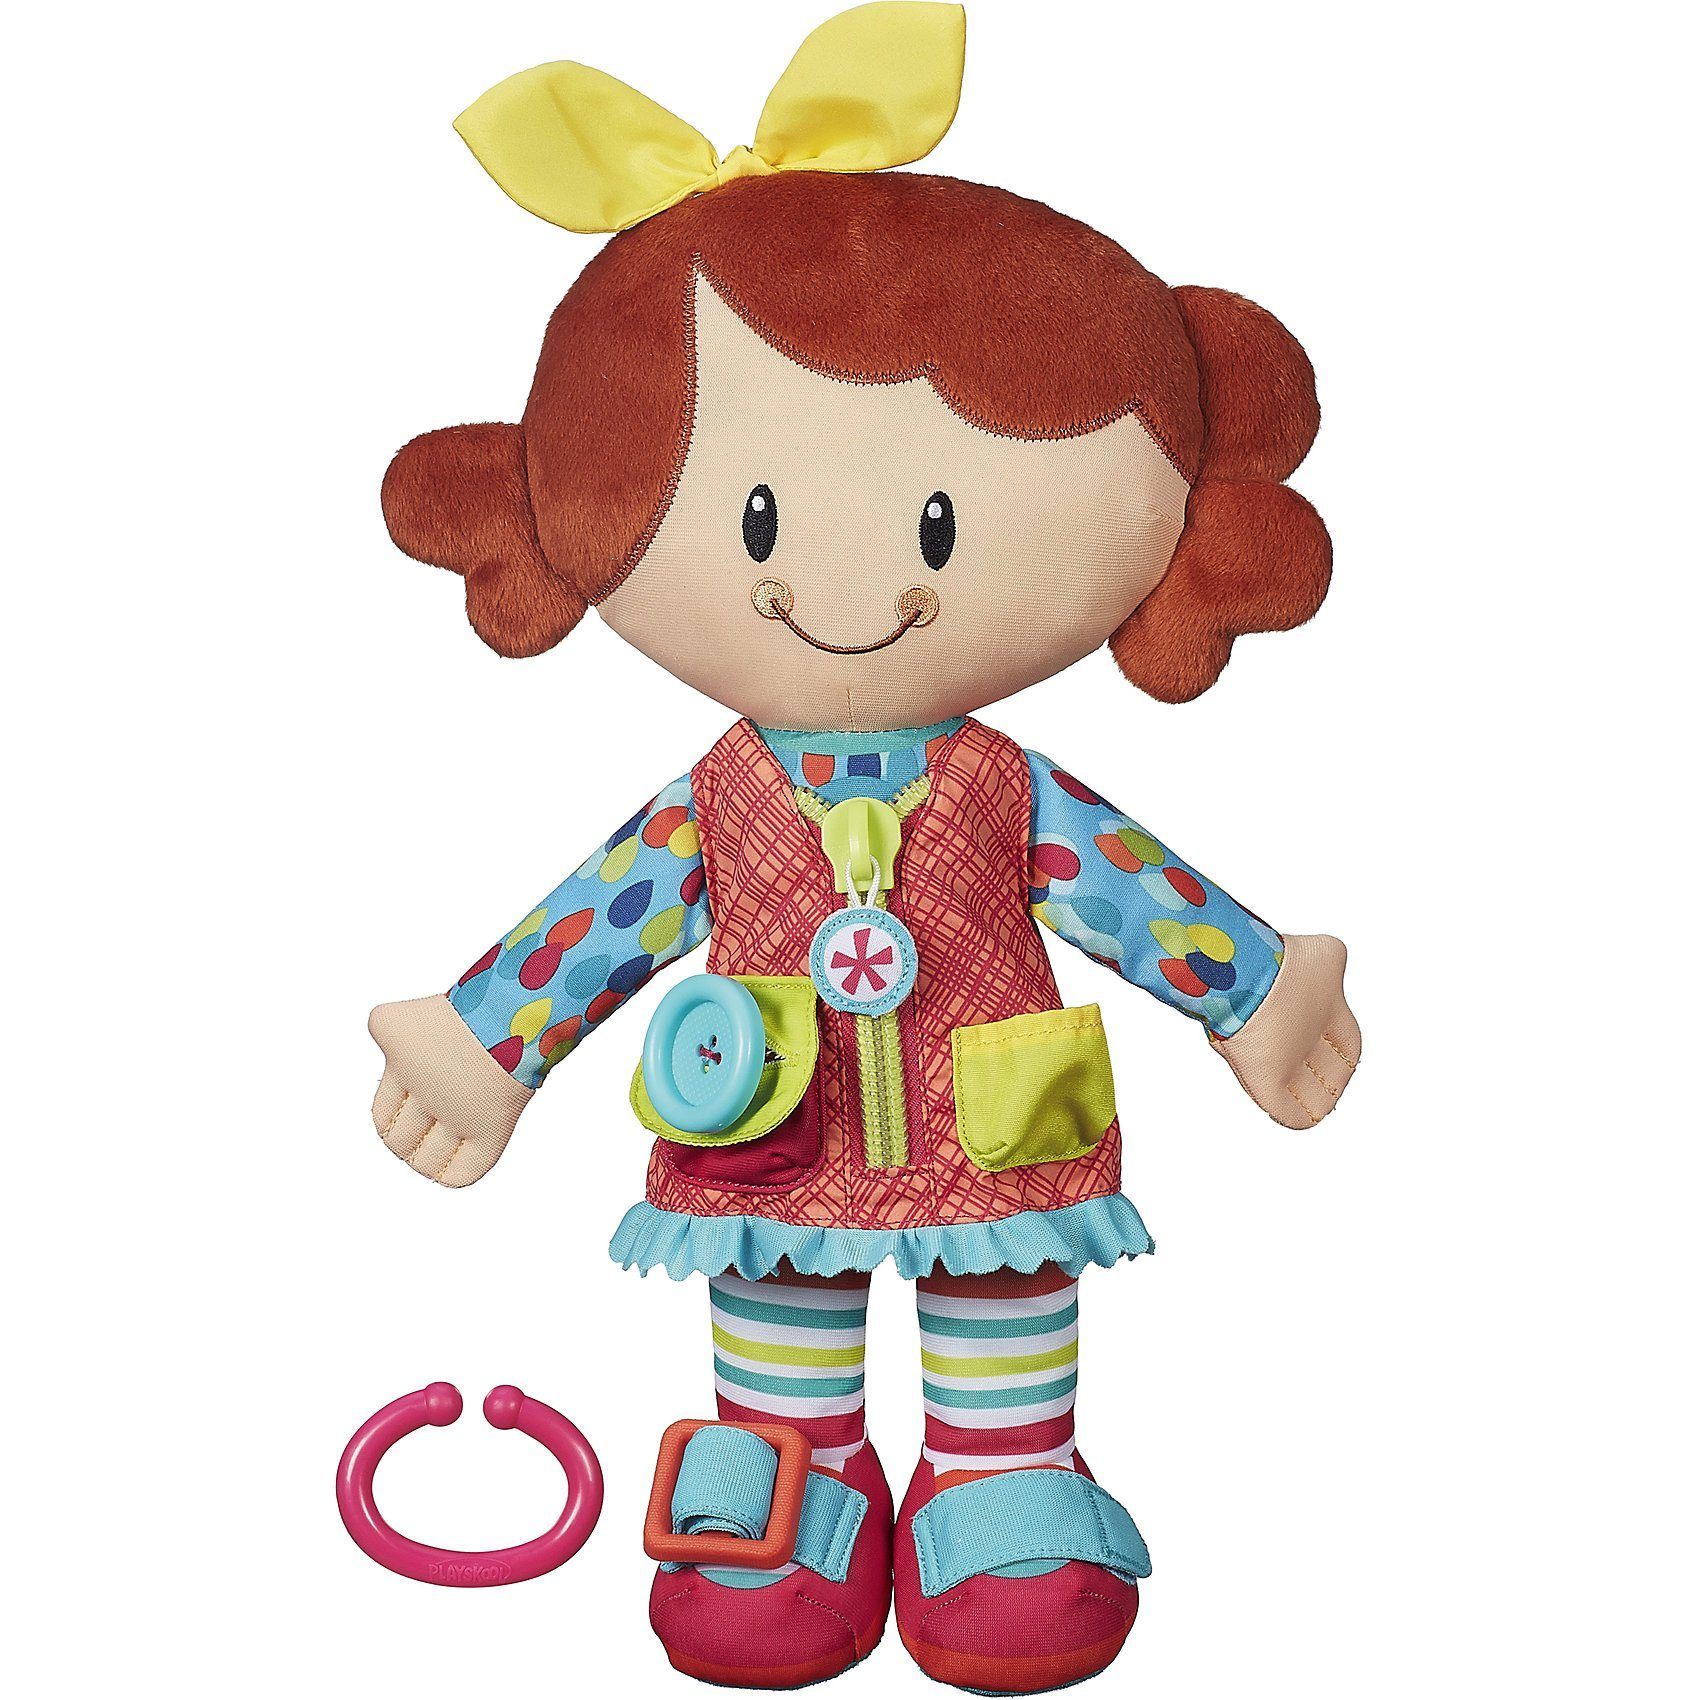 Hasbro Playskool - Anziehspaß-Freunde, Mädchen